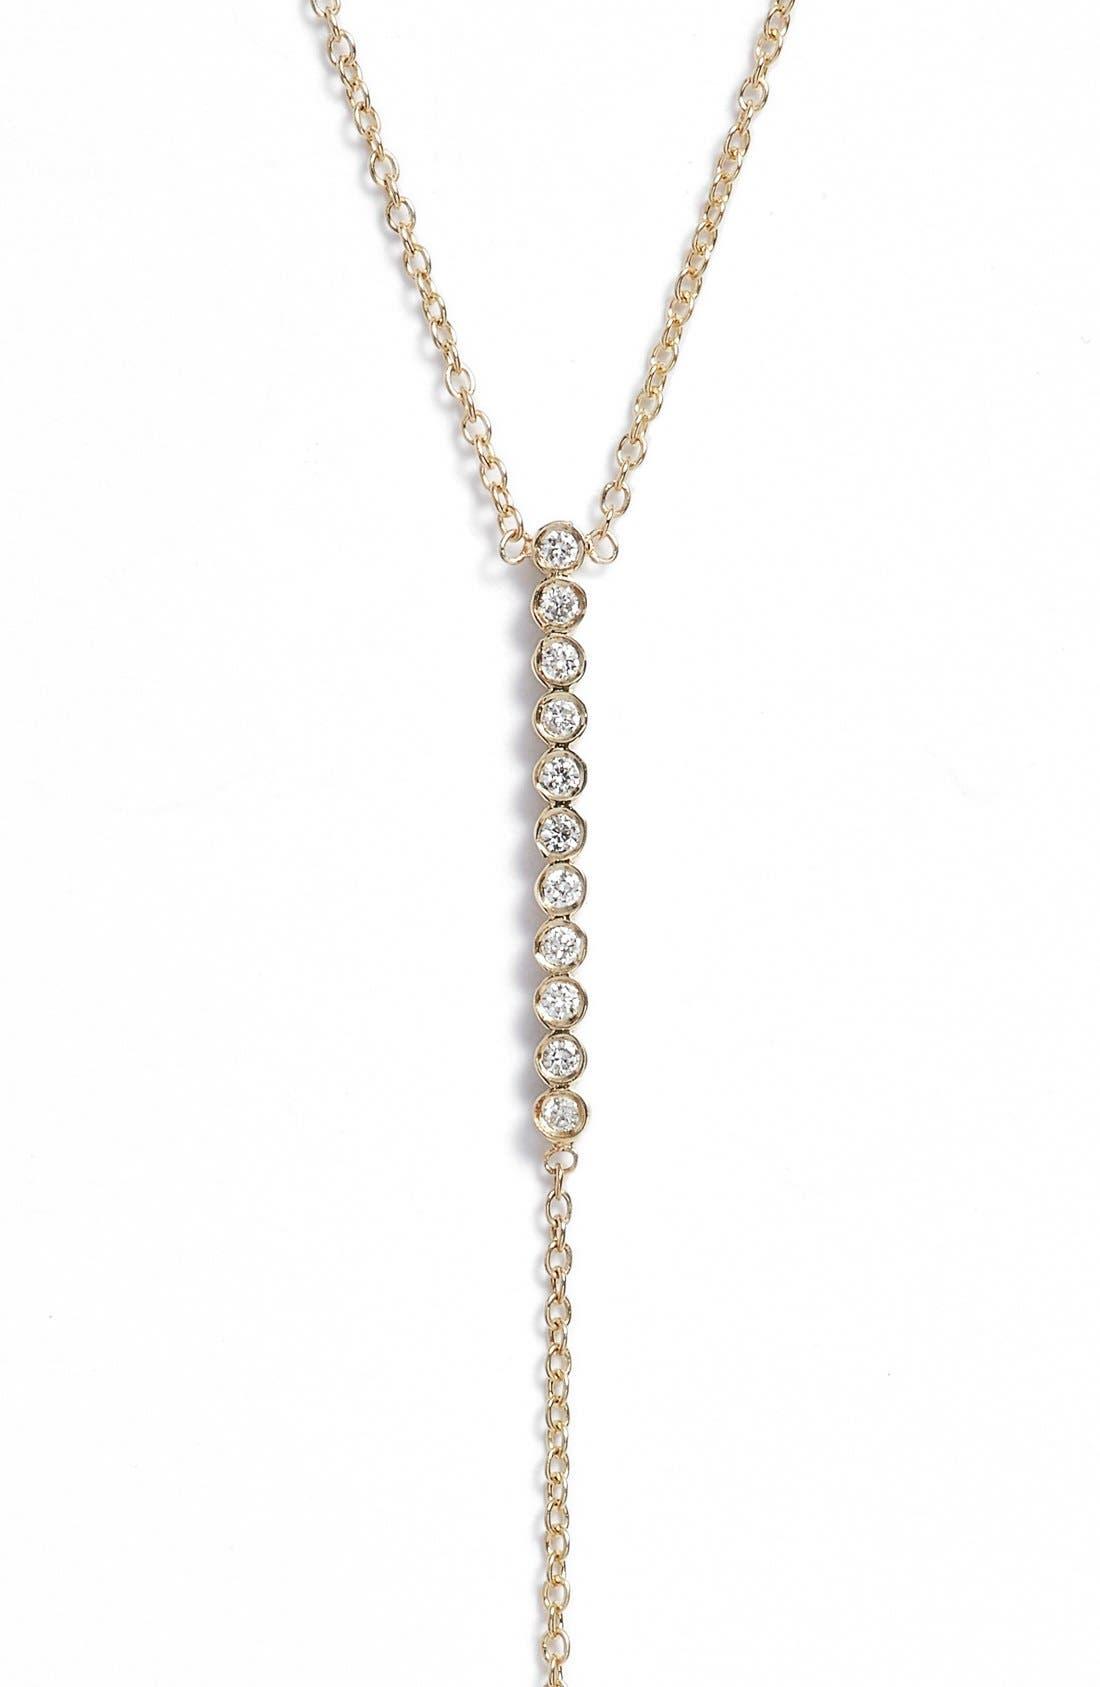 Main Image - Zoë Chicco Diamond Bar Y-Necklace